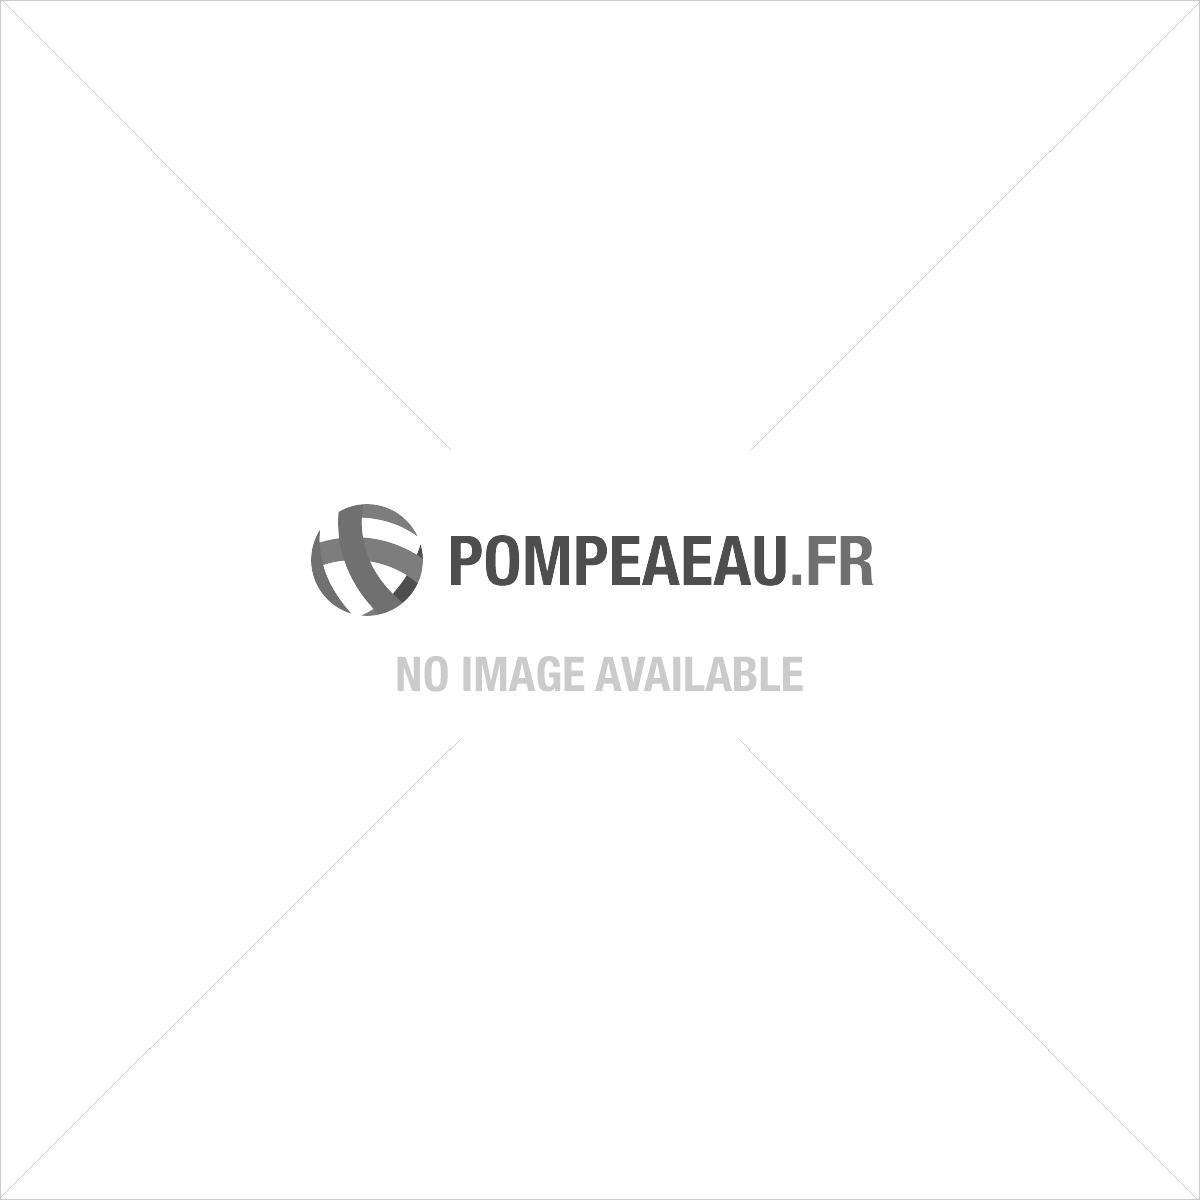 DAB AquajetInox 102/80 M Pompe surpresseur